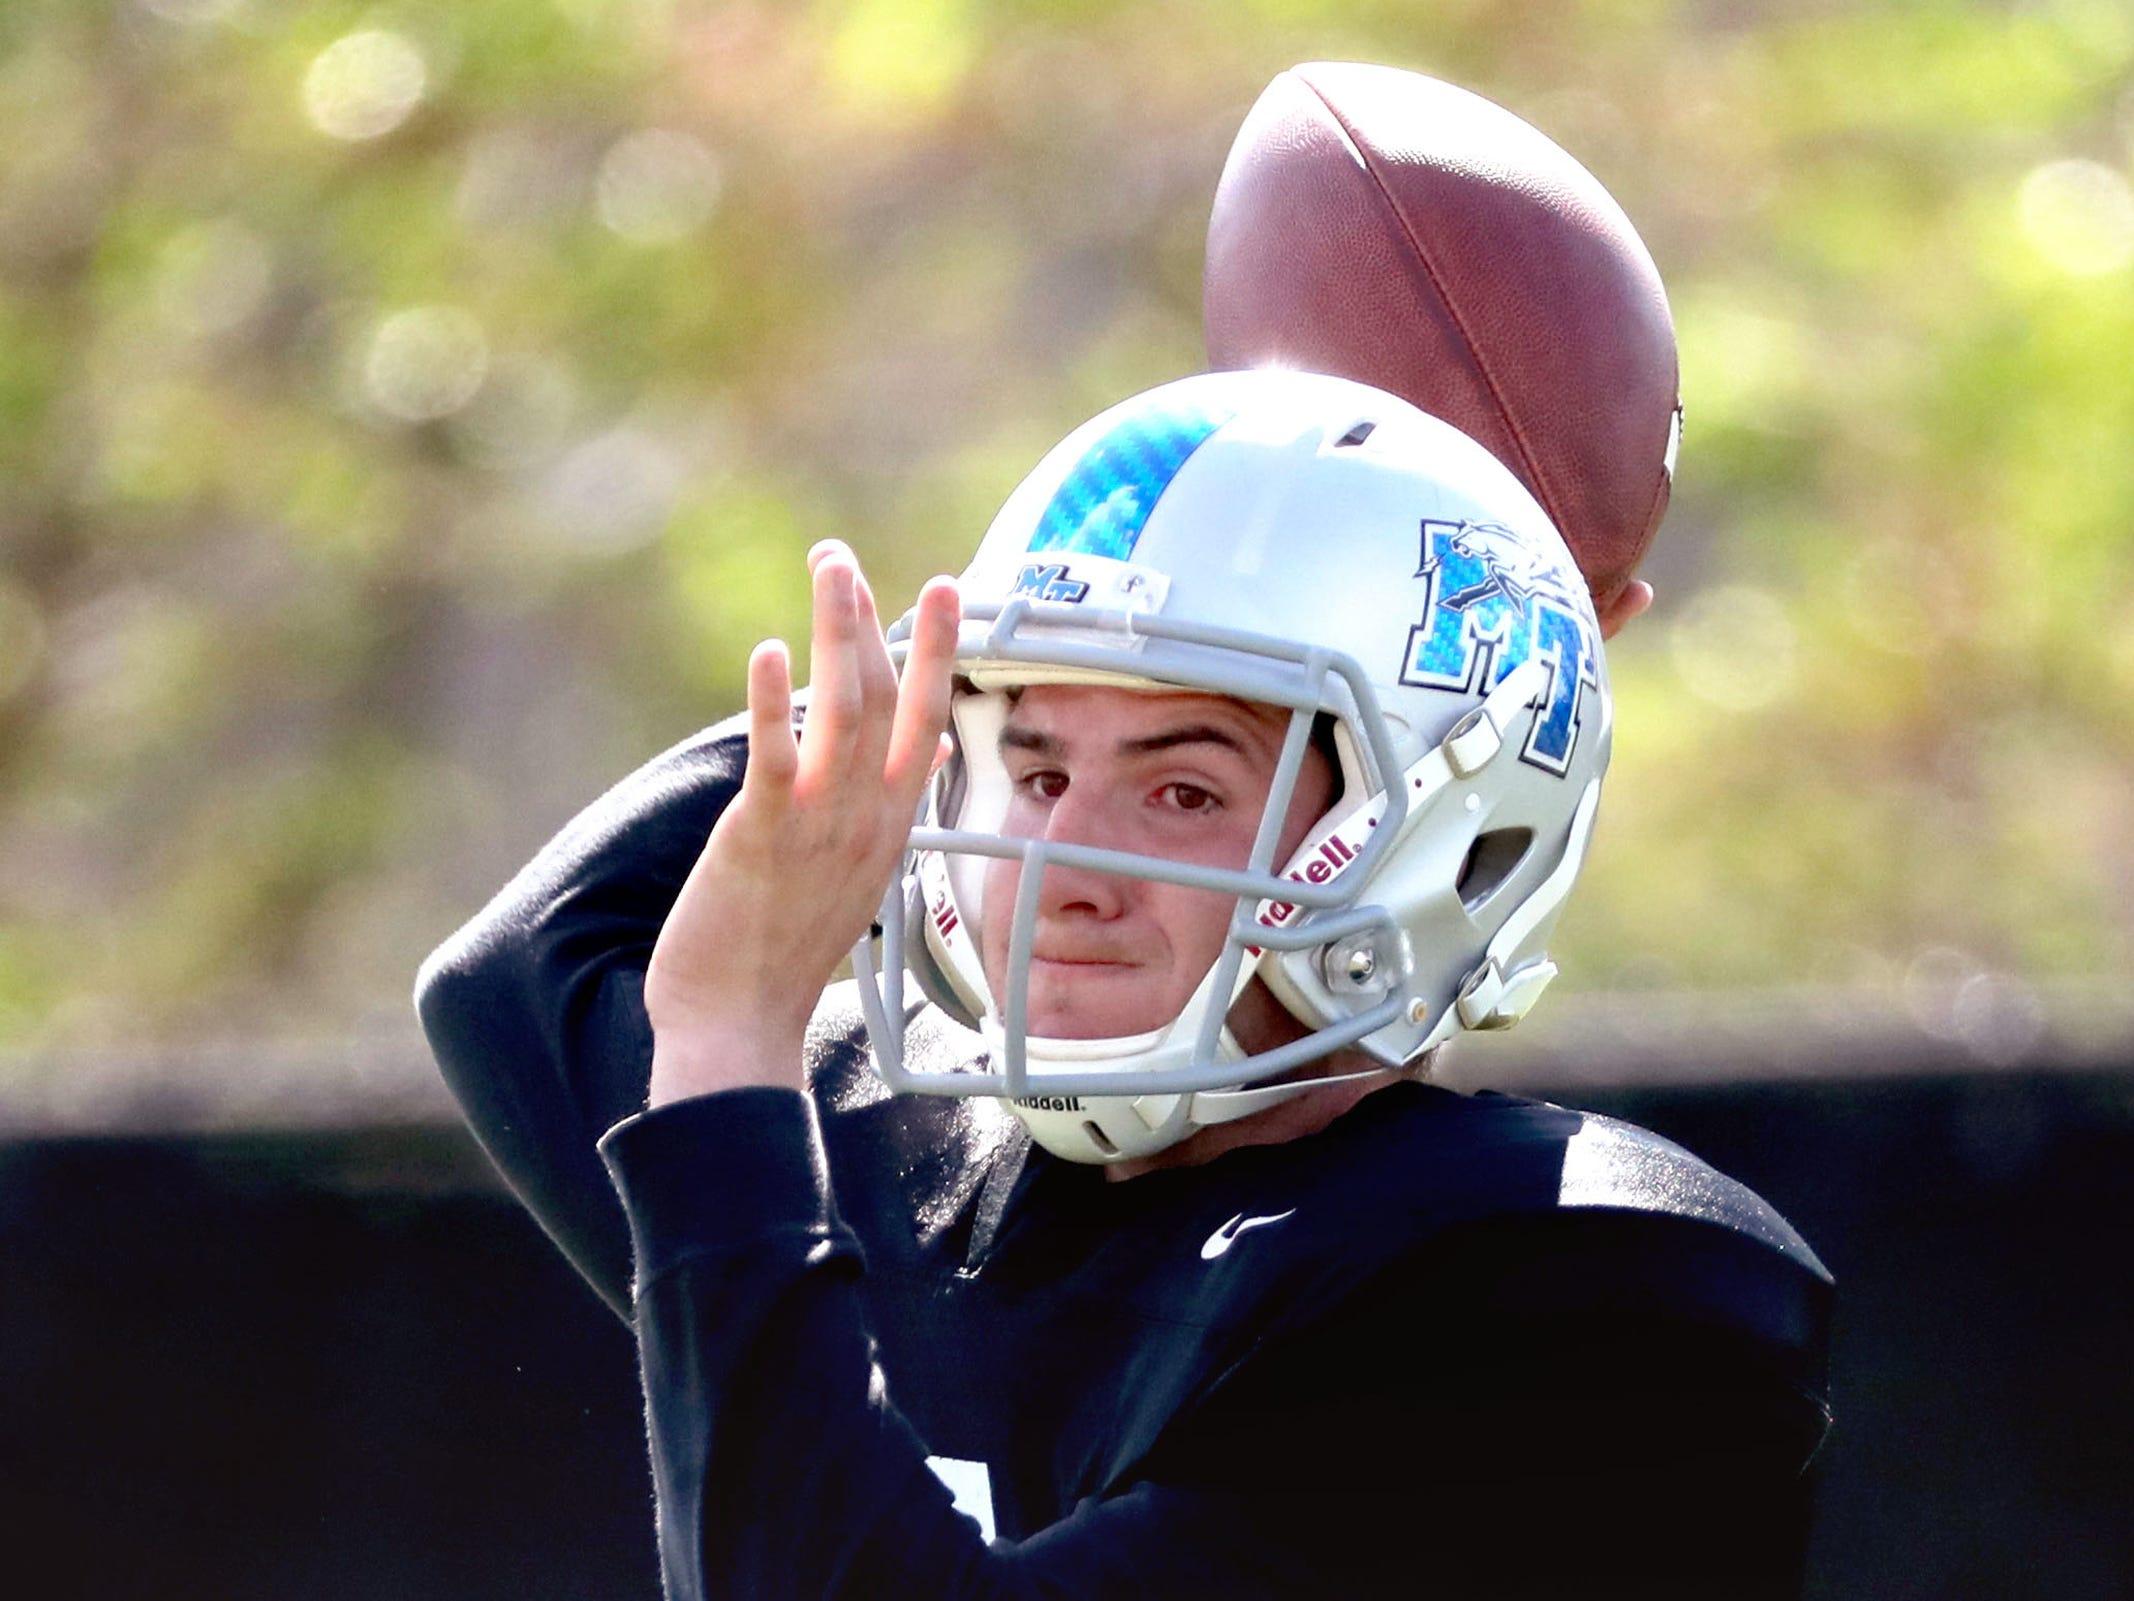 MTSU's quarterback Chance Nolan (6) passes the ball during MTSU's football practice, in Murfreesboro on Tuesday April 9, 2019.